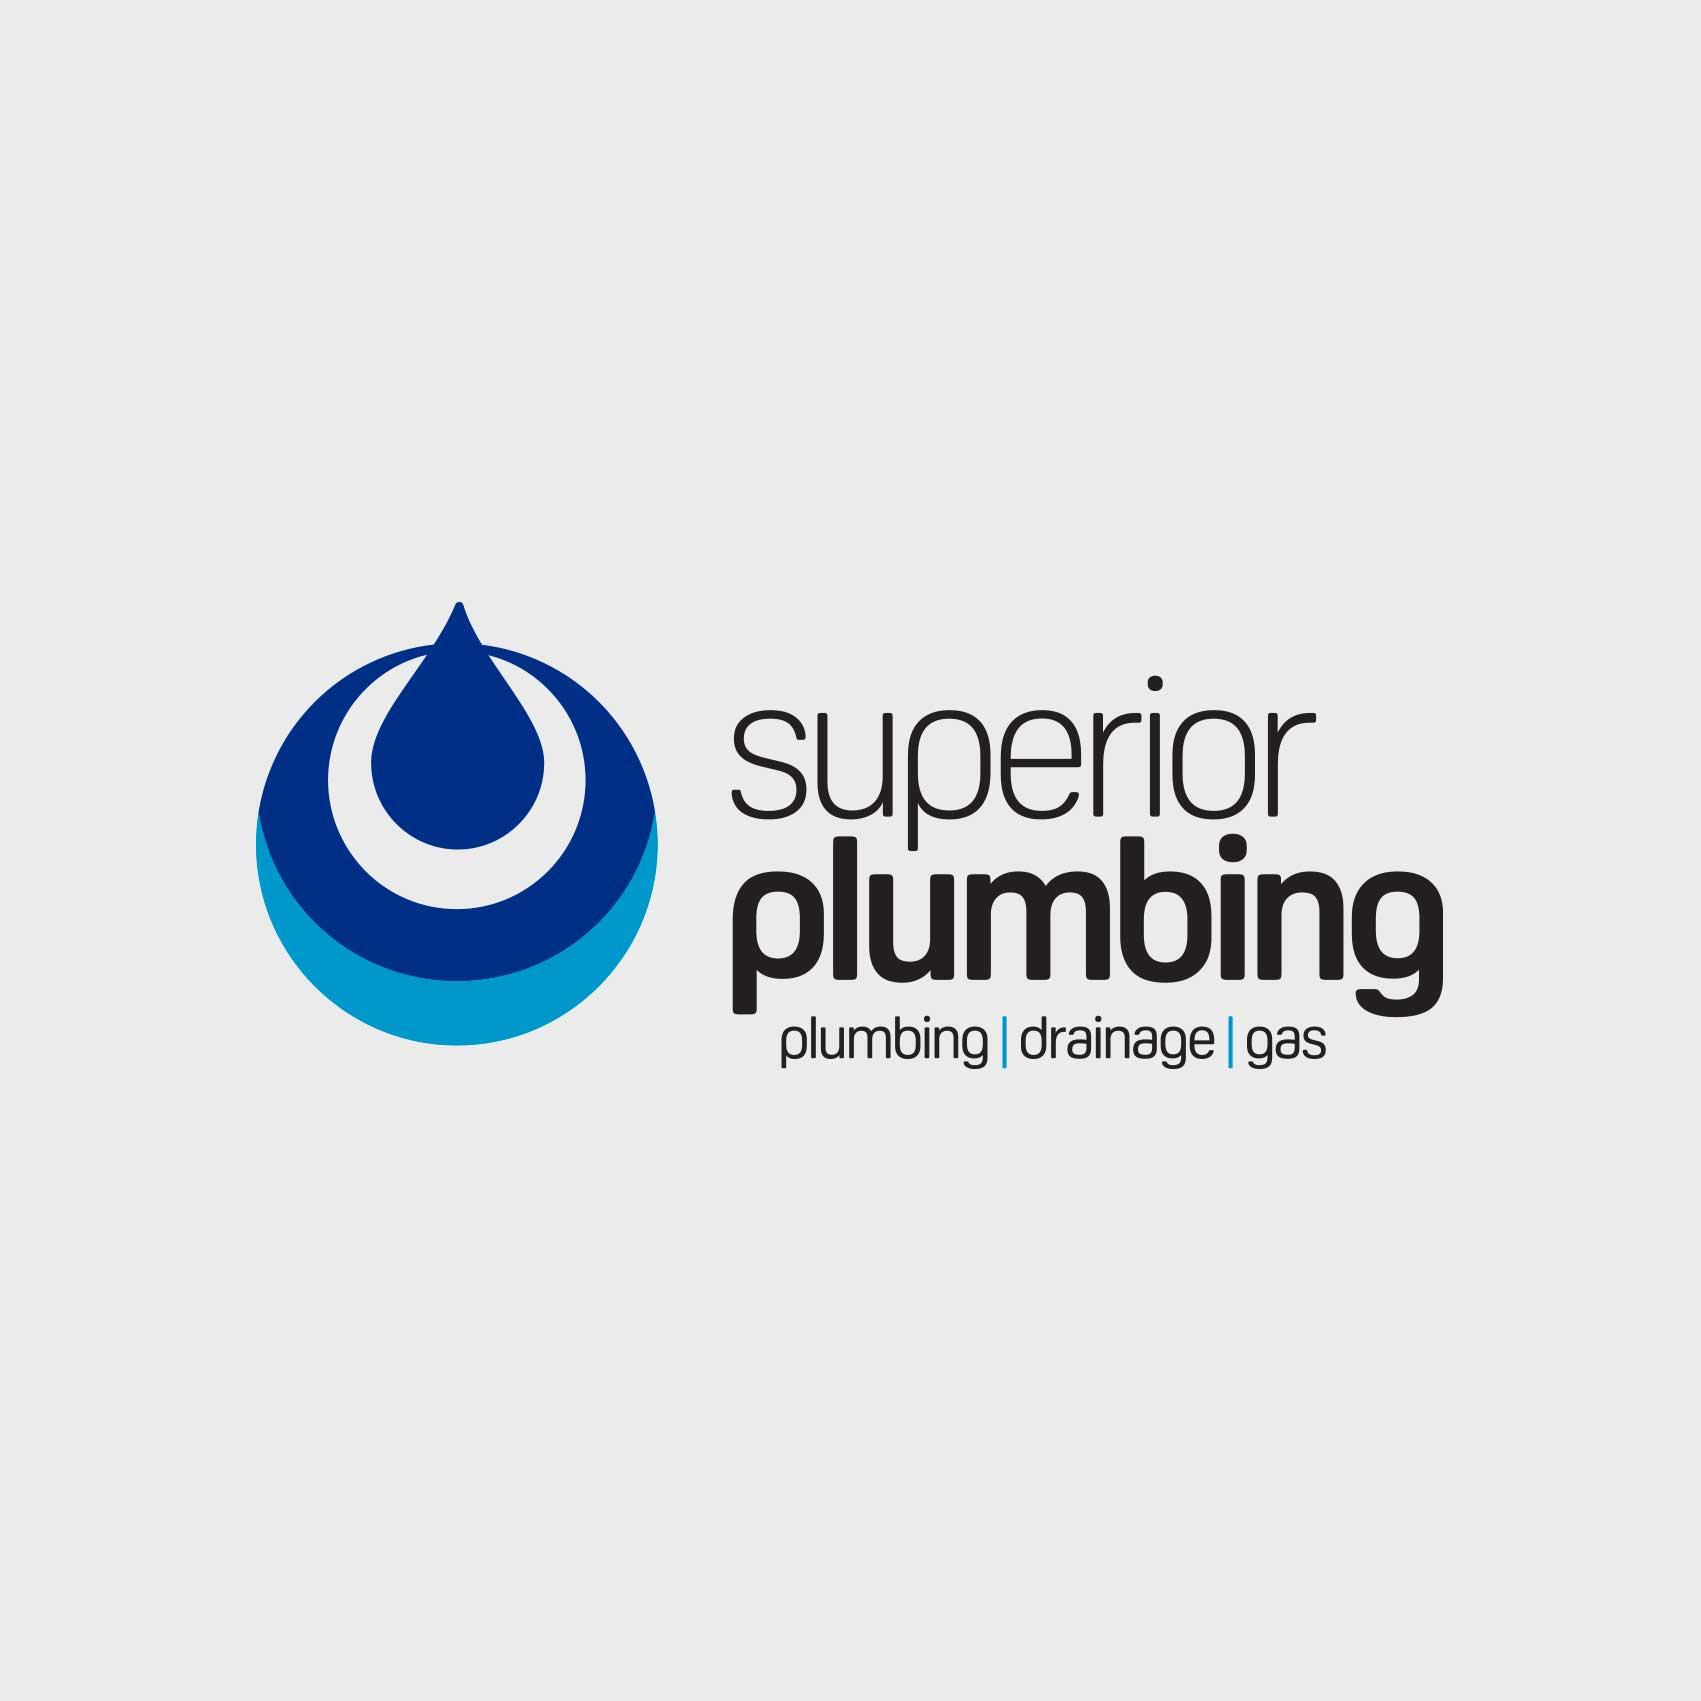 superior-plumbing-graphic-design-logo-wollongong-visual-energy-signs-illawarra-industry.jpg